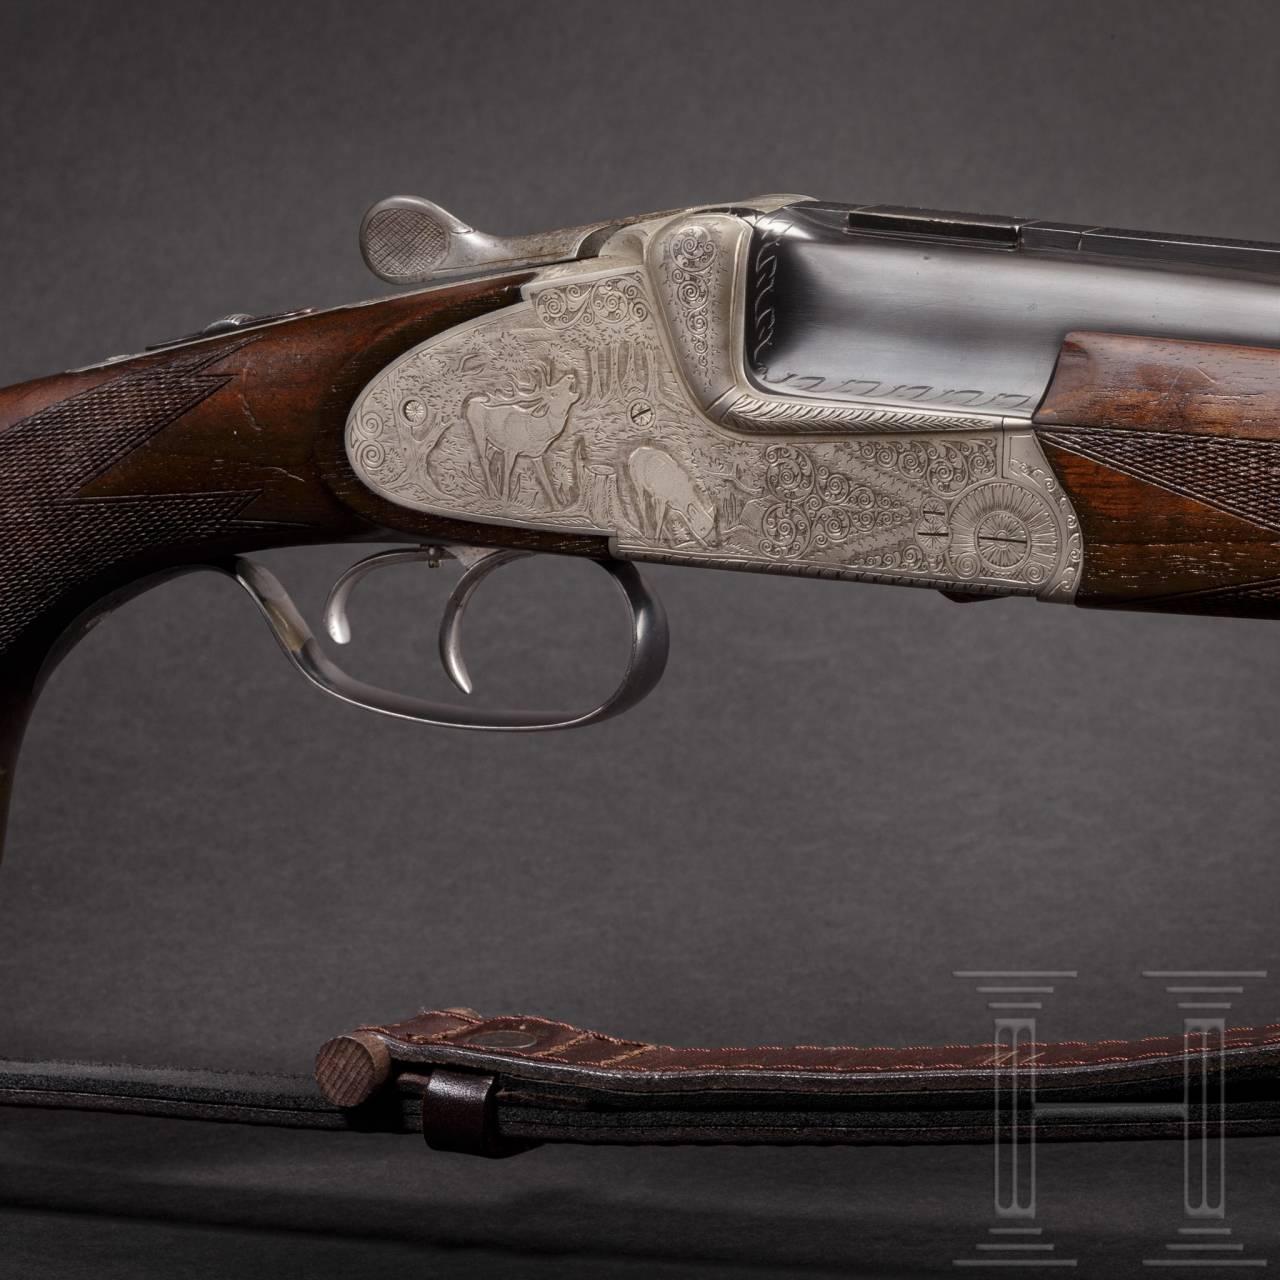 An over and under Scheiring-Düsel combination rifle with insert barrel and Schmidt & Bender scope